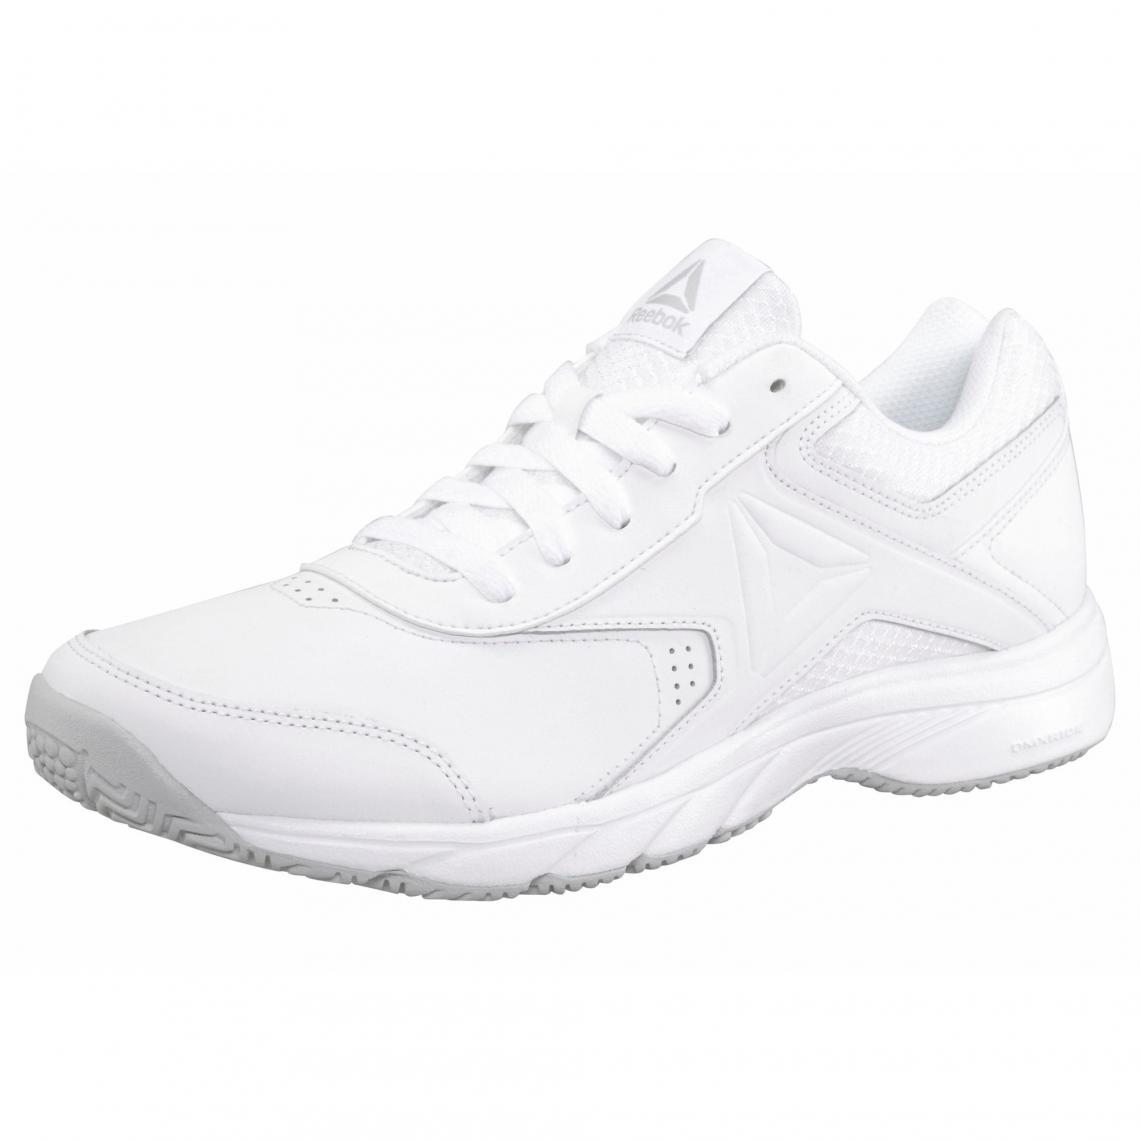 06e00fe6906 Chaussures de marche légères homme Work n Cushion 3.0 Reebok - Blanc Reebok  Homme